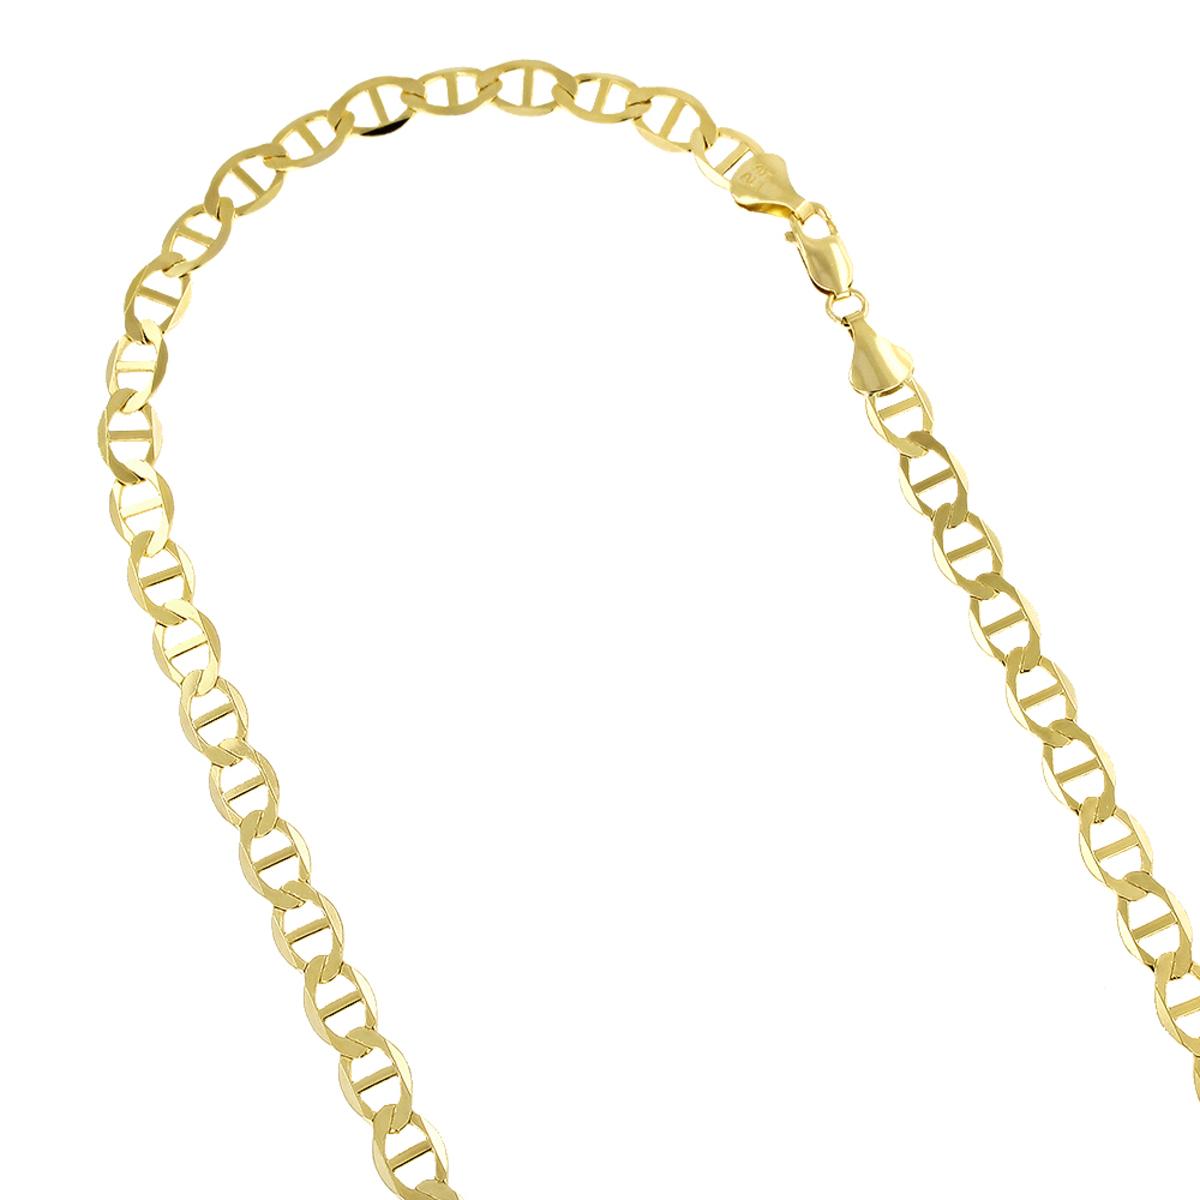 LUXURMAN Solid 14k Gold Mariner Chain For Men & Women 5.5mm Wide